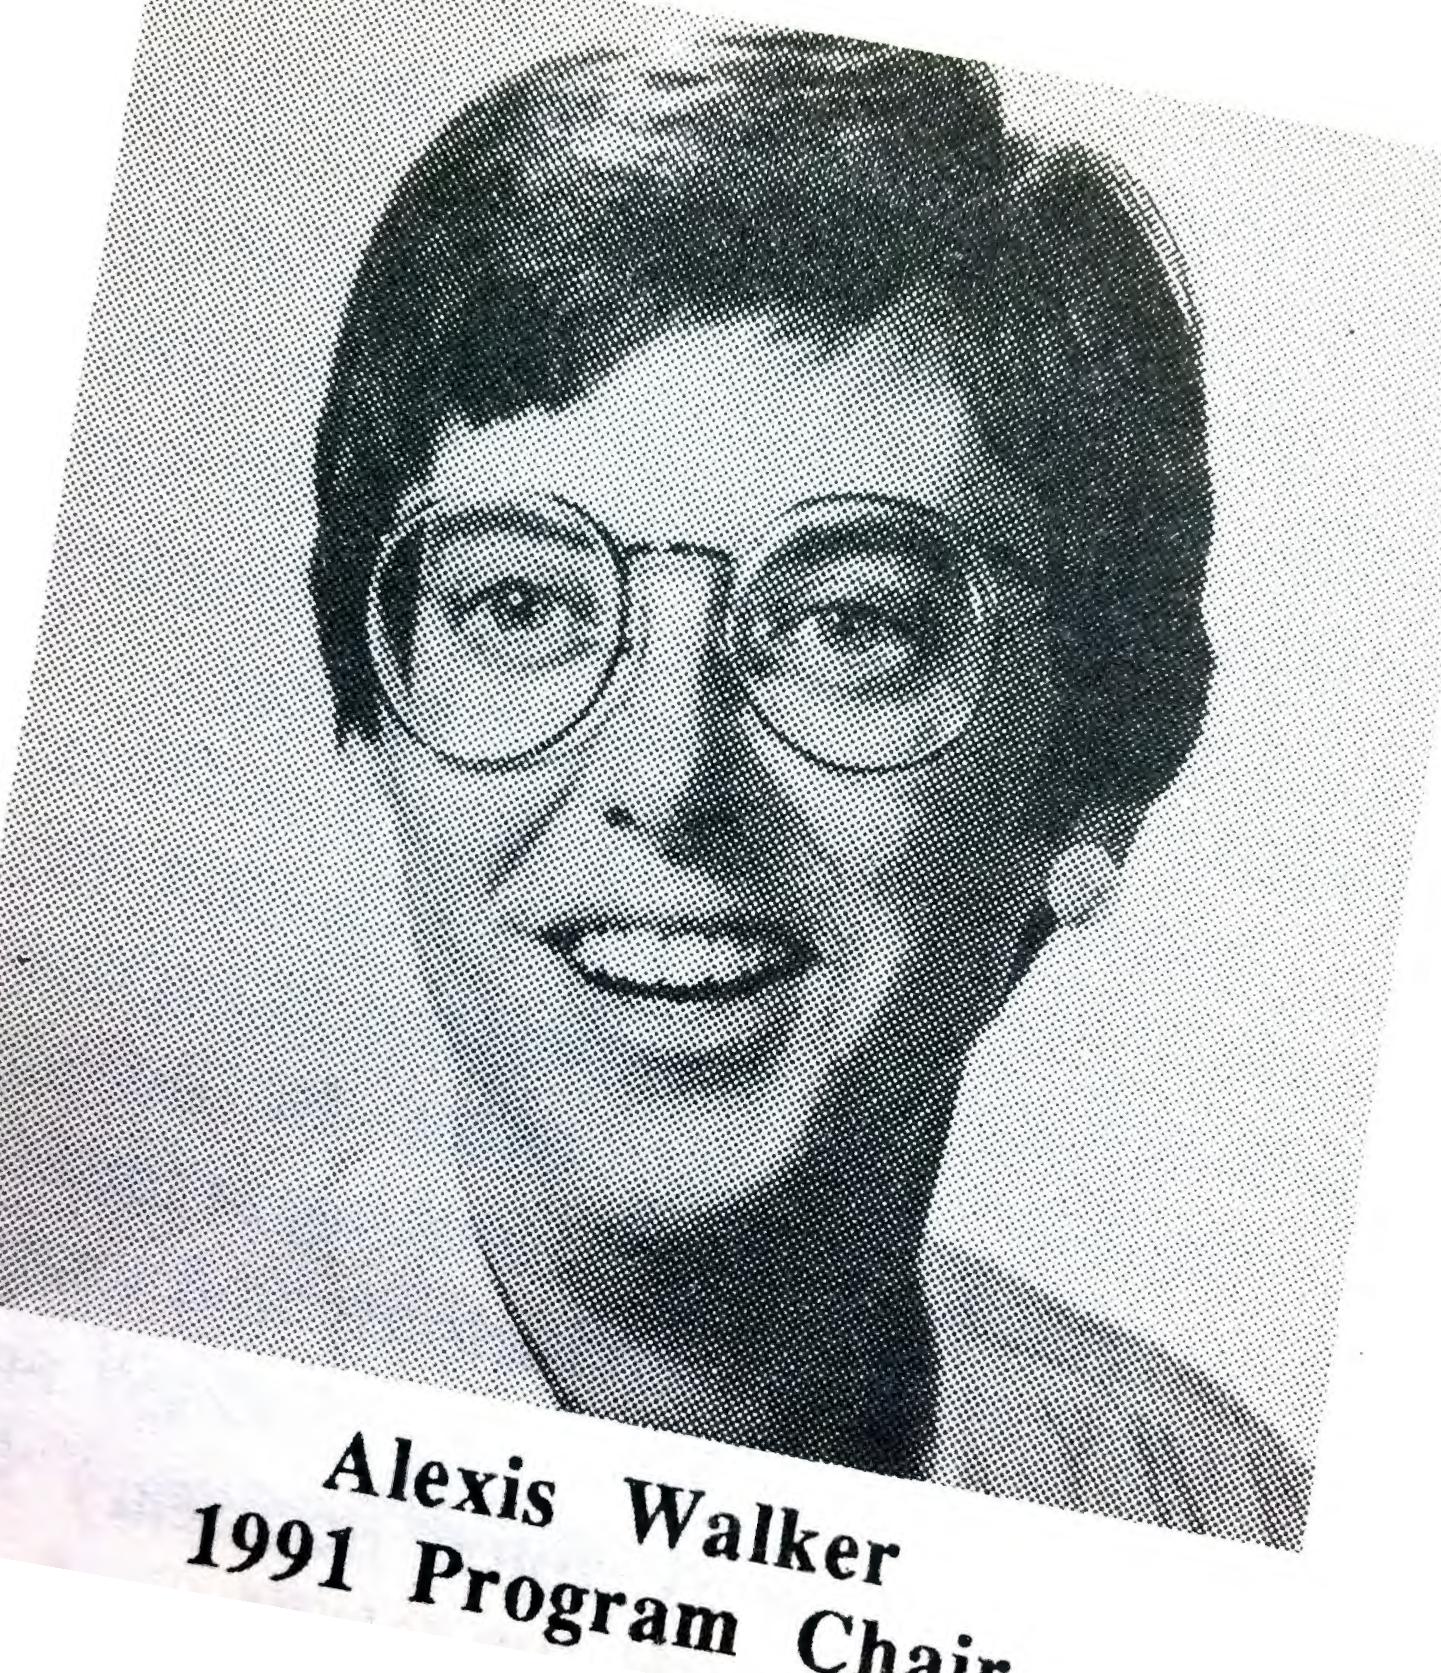 Alexis Walker